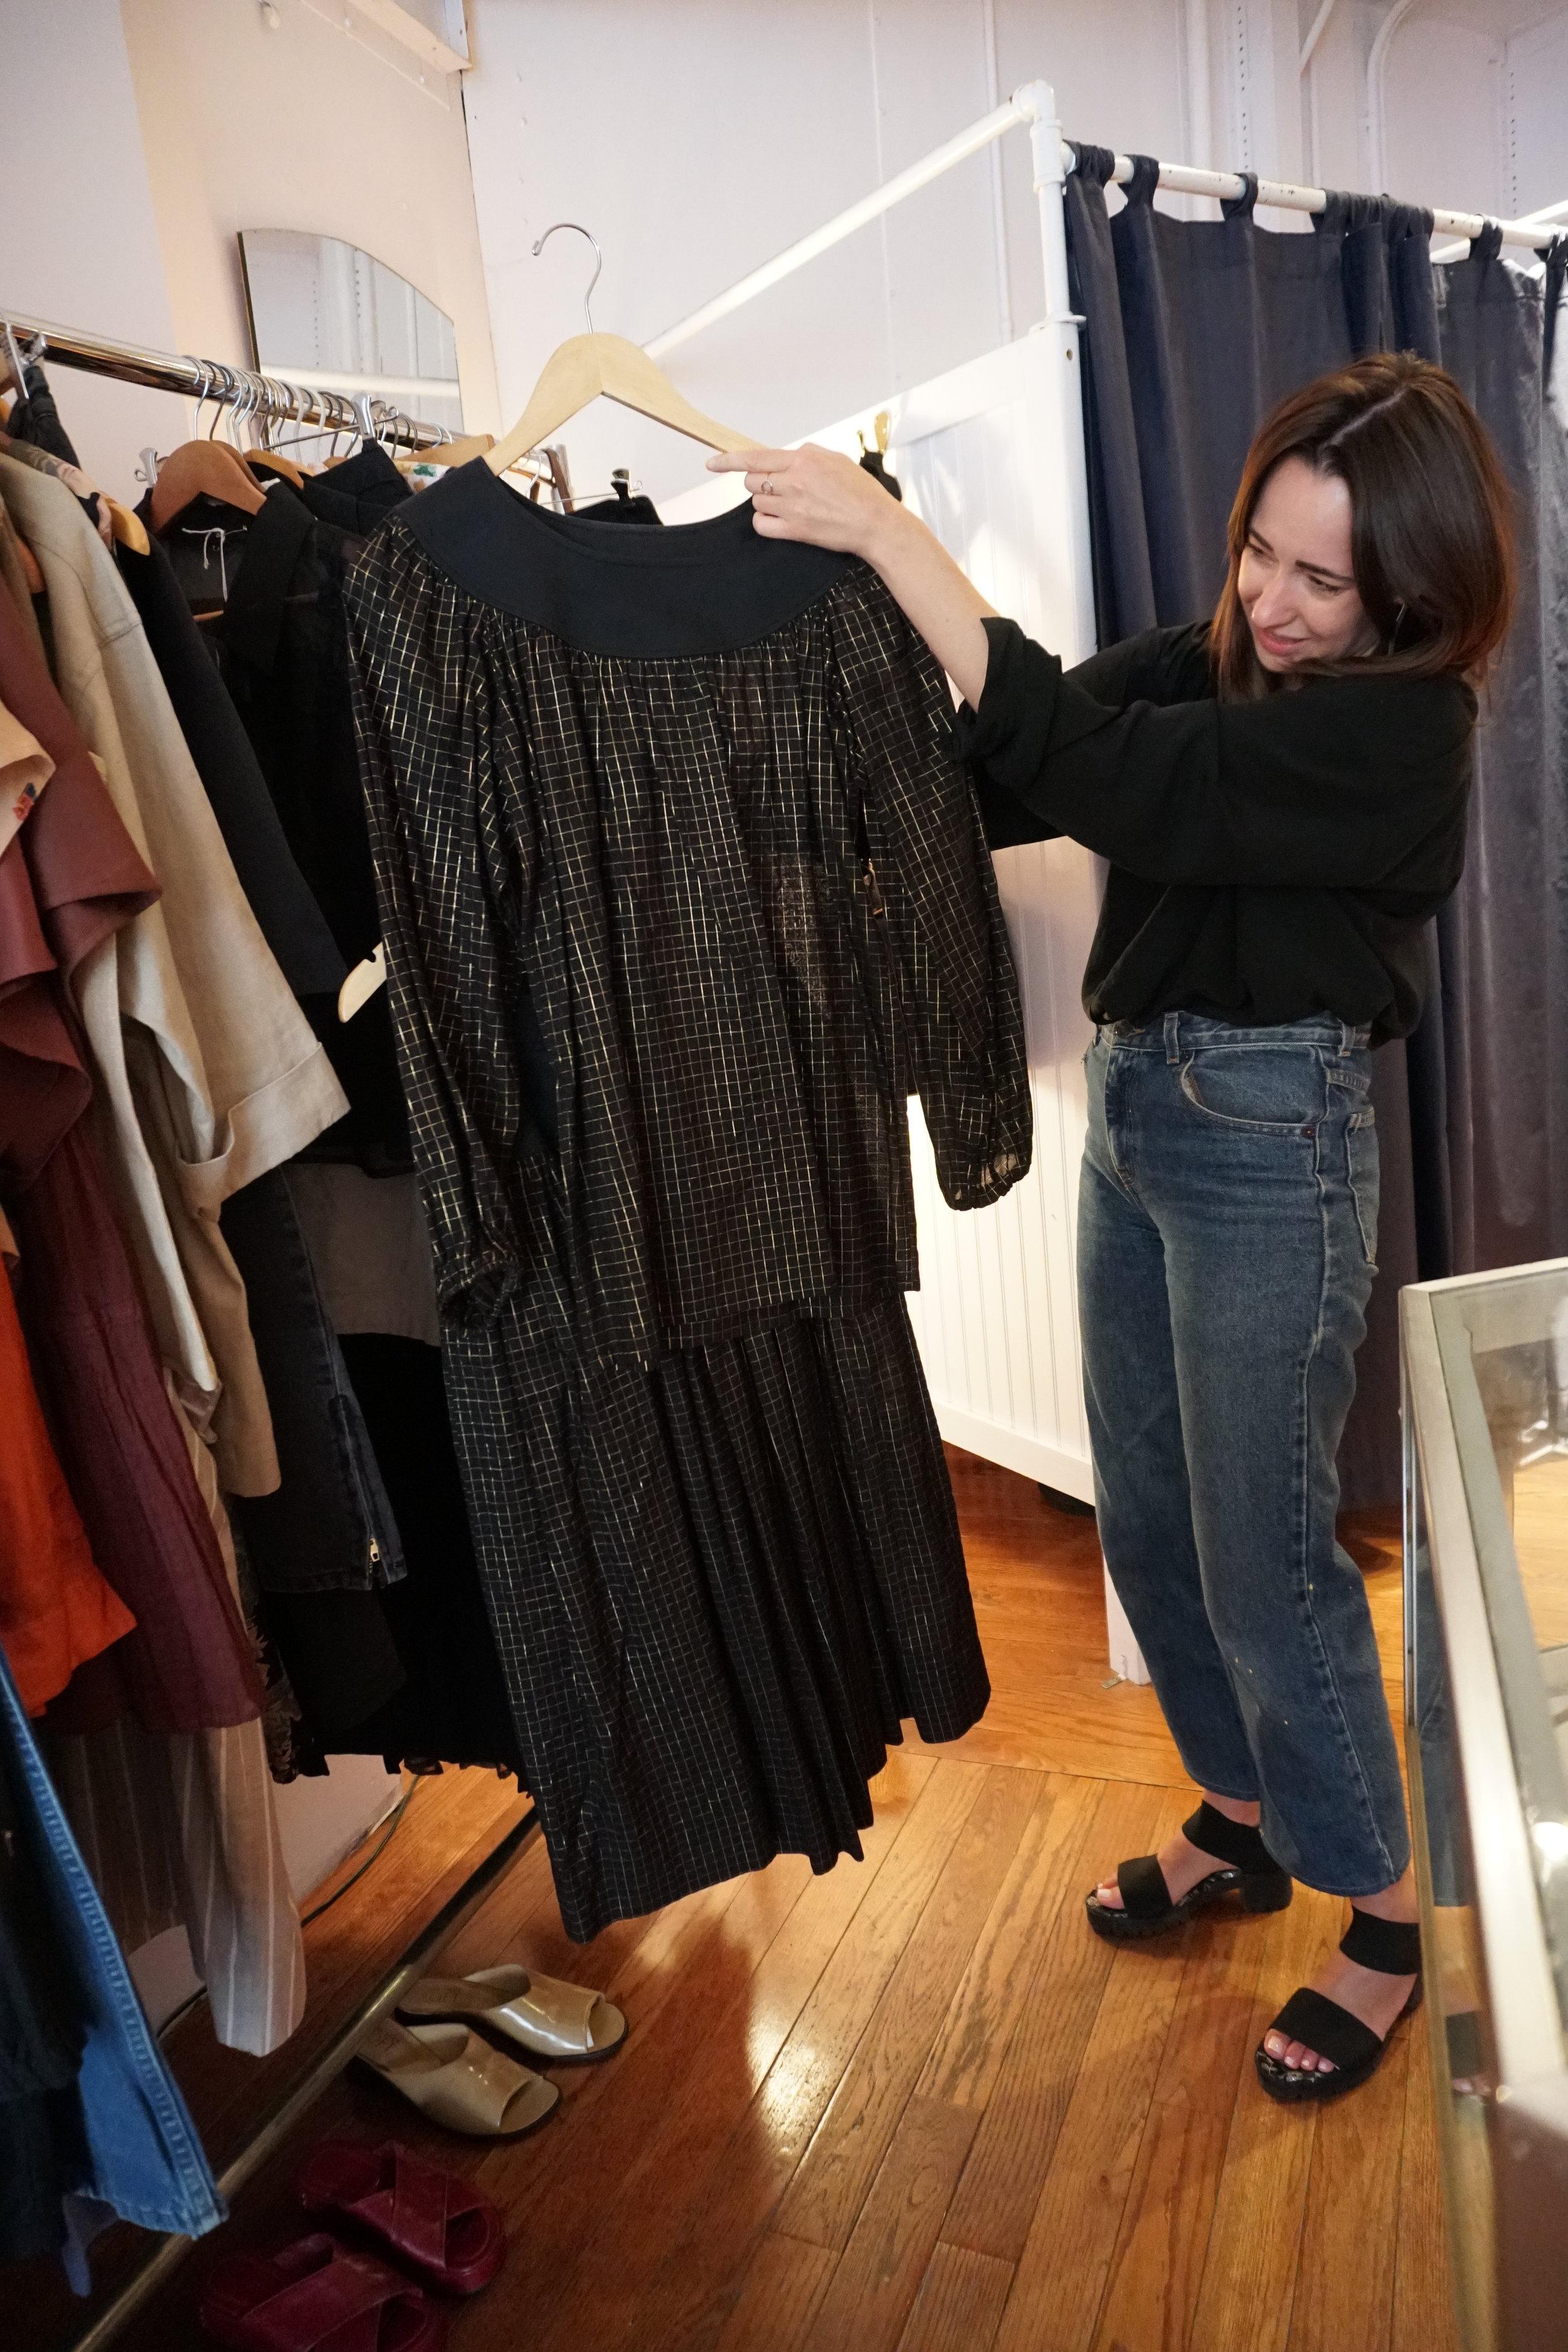 Horizons+Best+Vintage+Clothing+Stores+in+Williamsburg%2C+